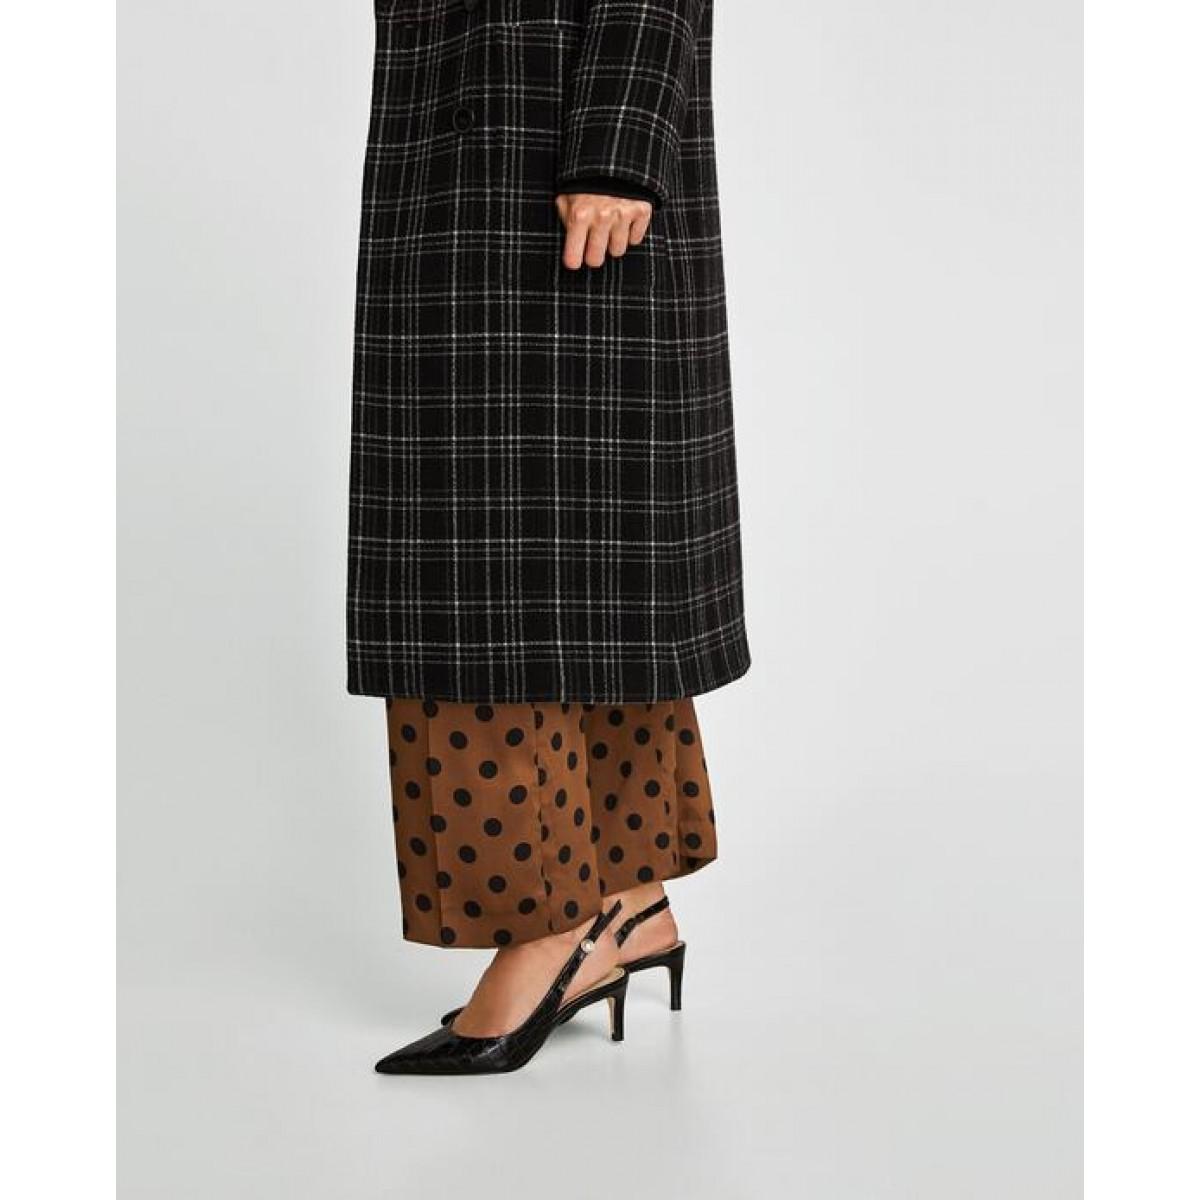 Zara Slingback Leather High Heel Court Shoes